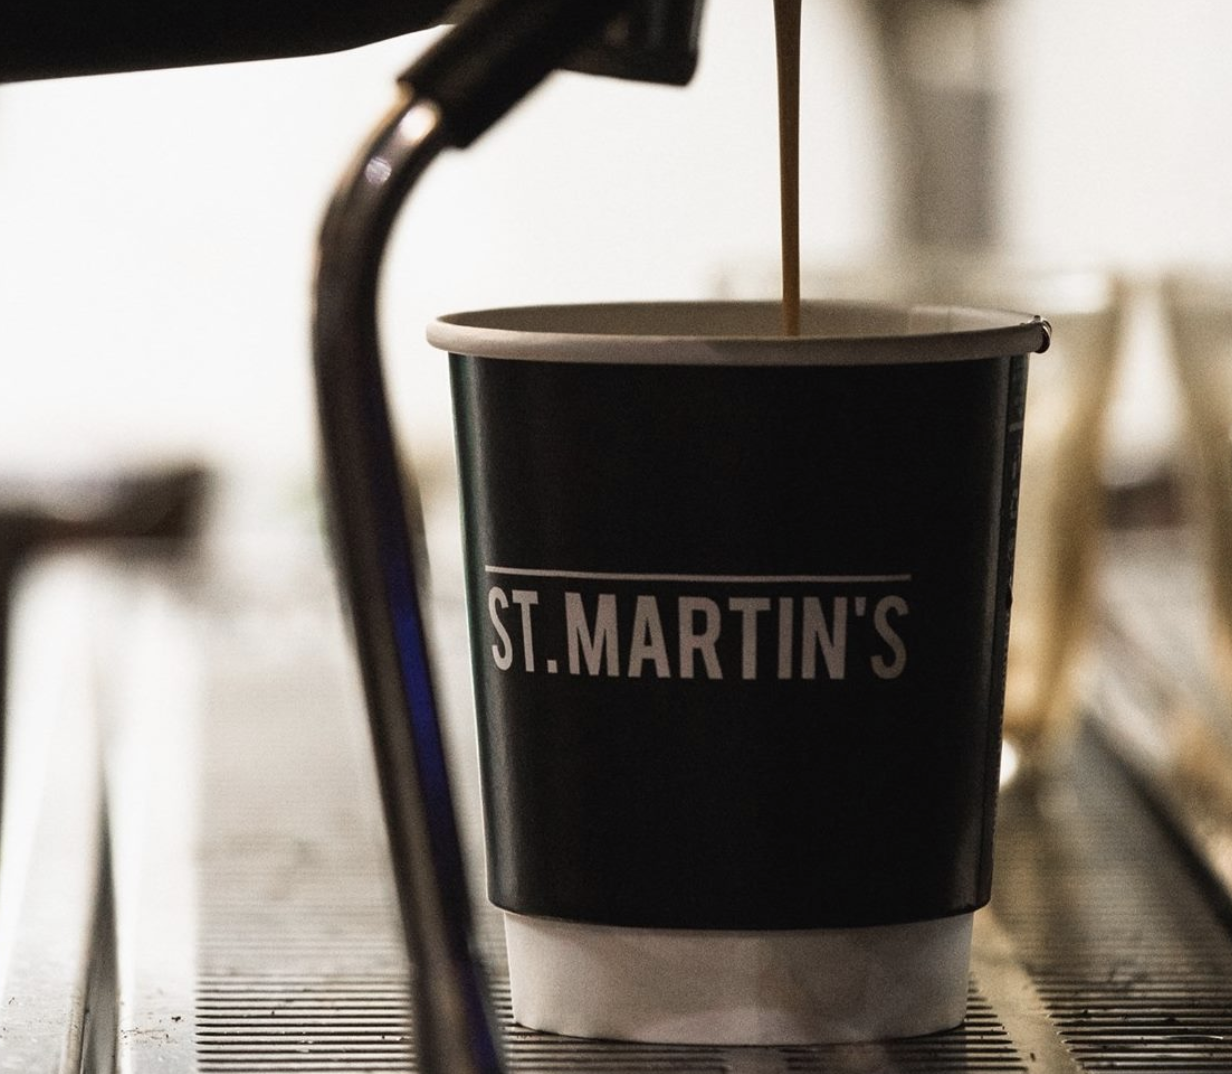 St Martins Coffee Shop